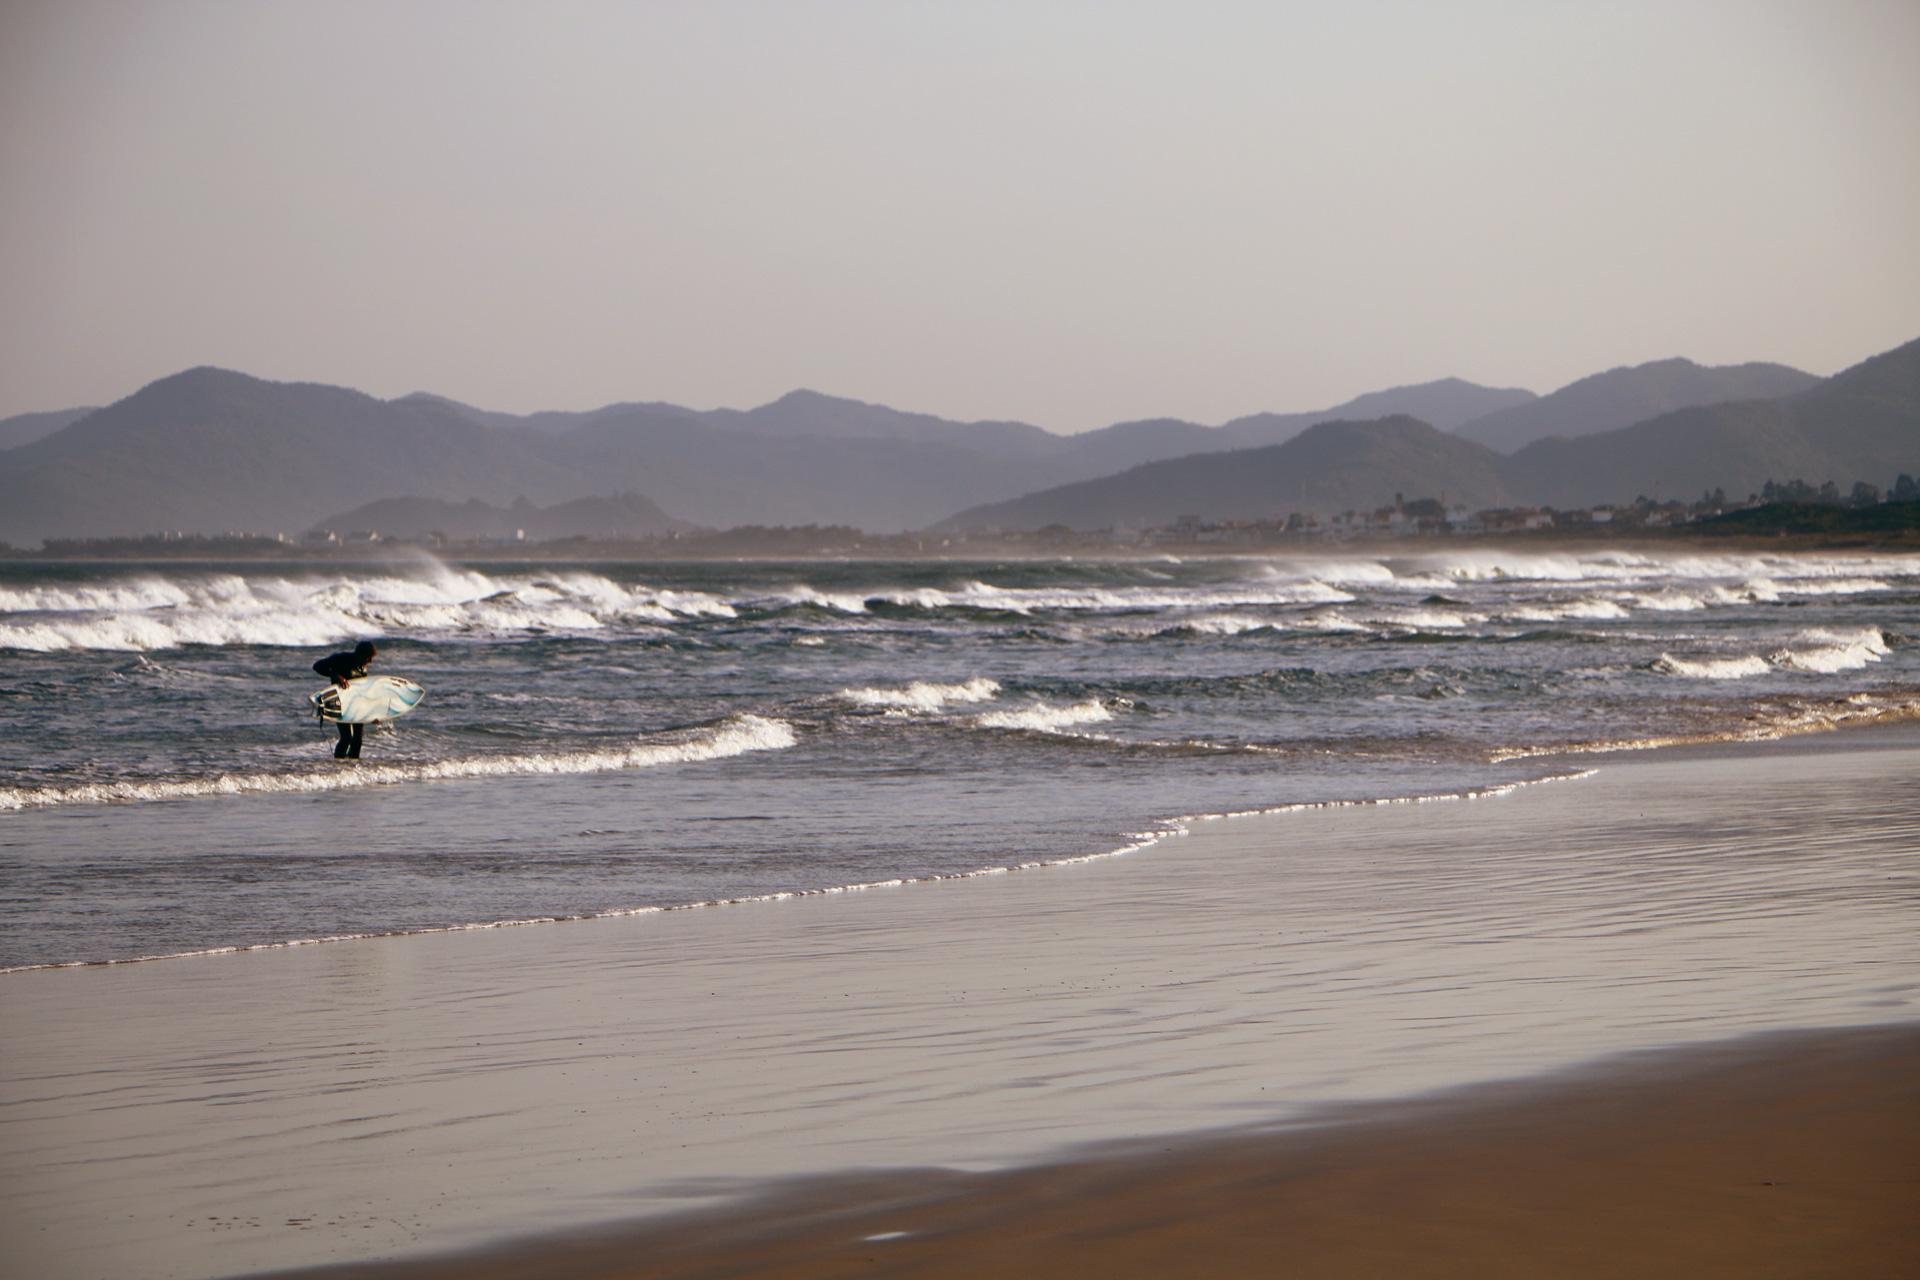 surfer-praia-joaquina-florianopolis